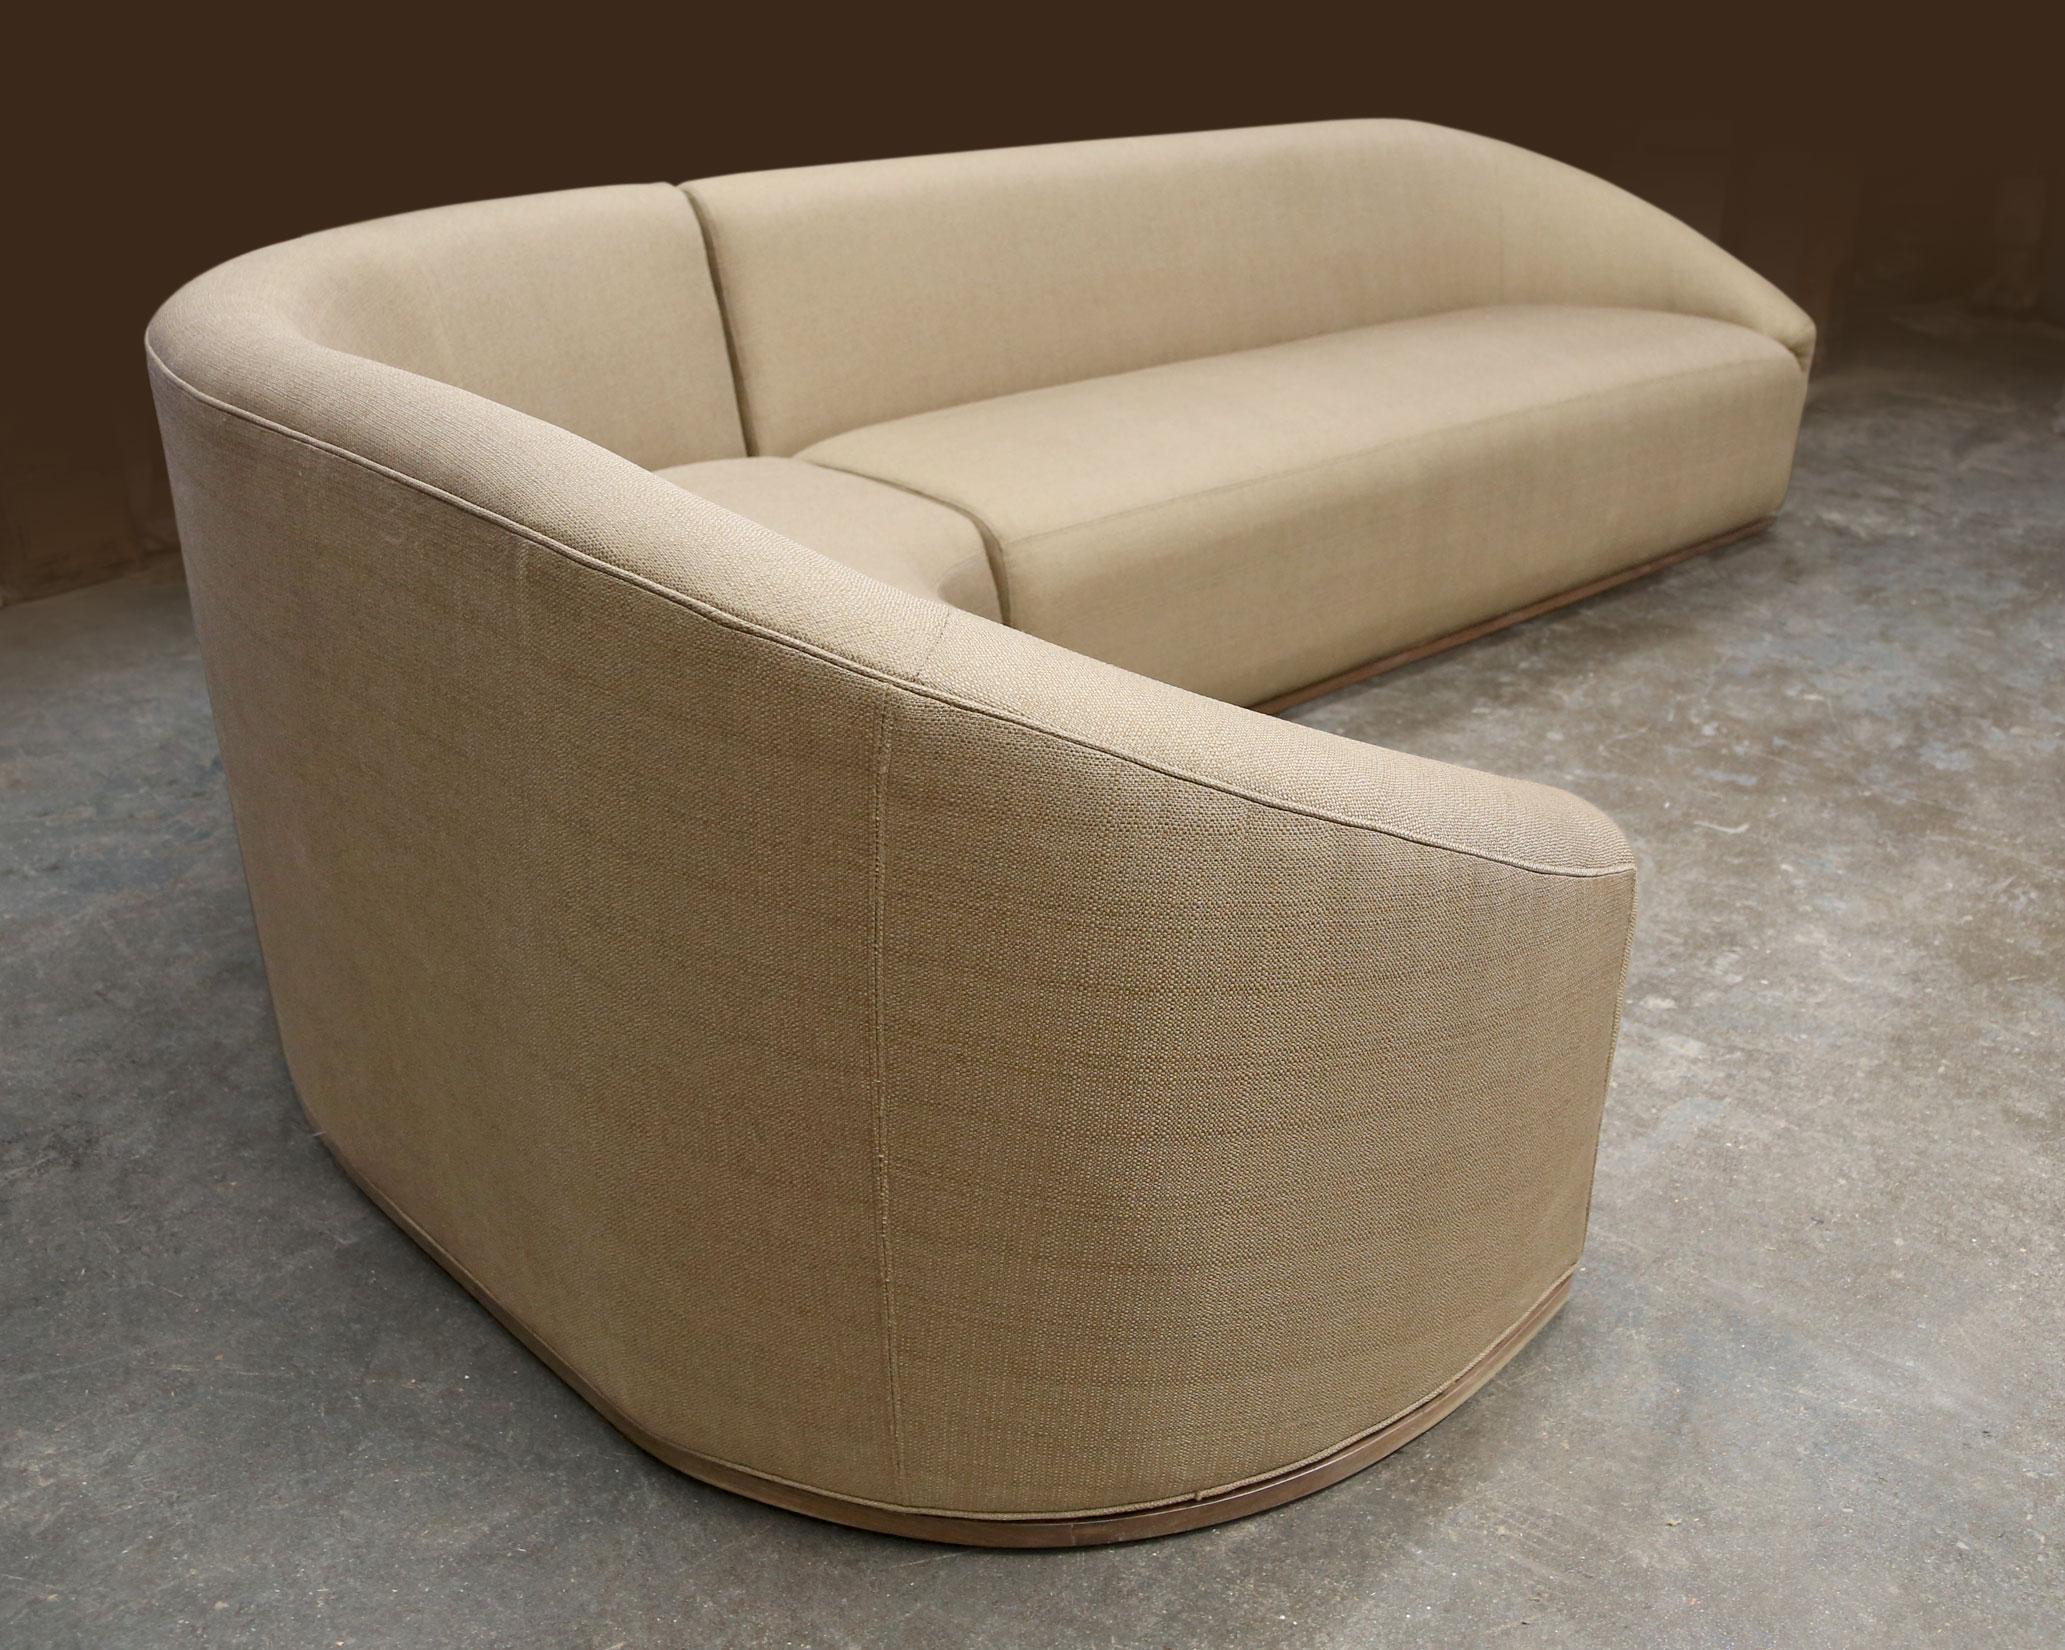 Baashe Sectional Sofa